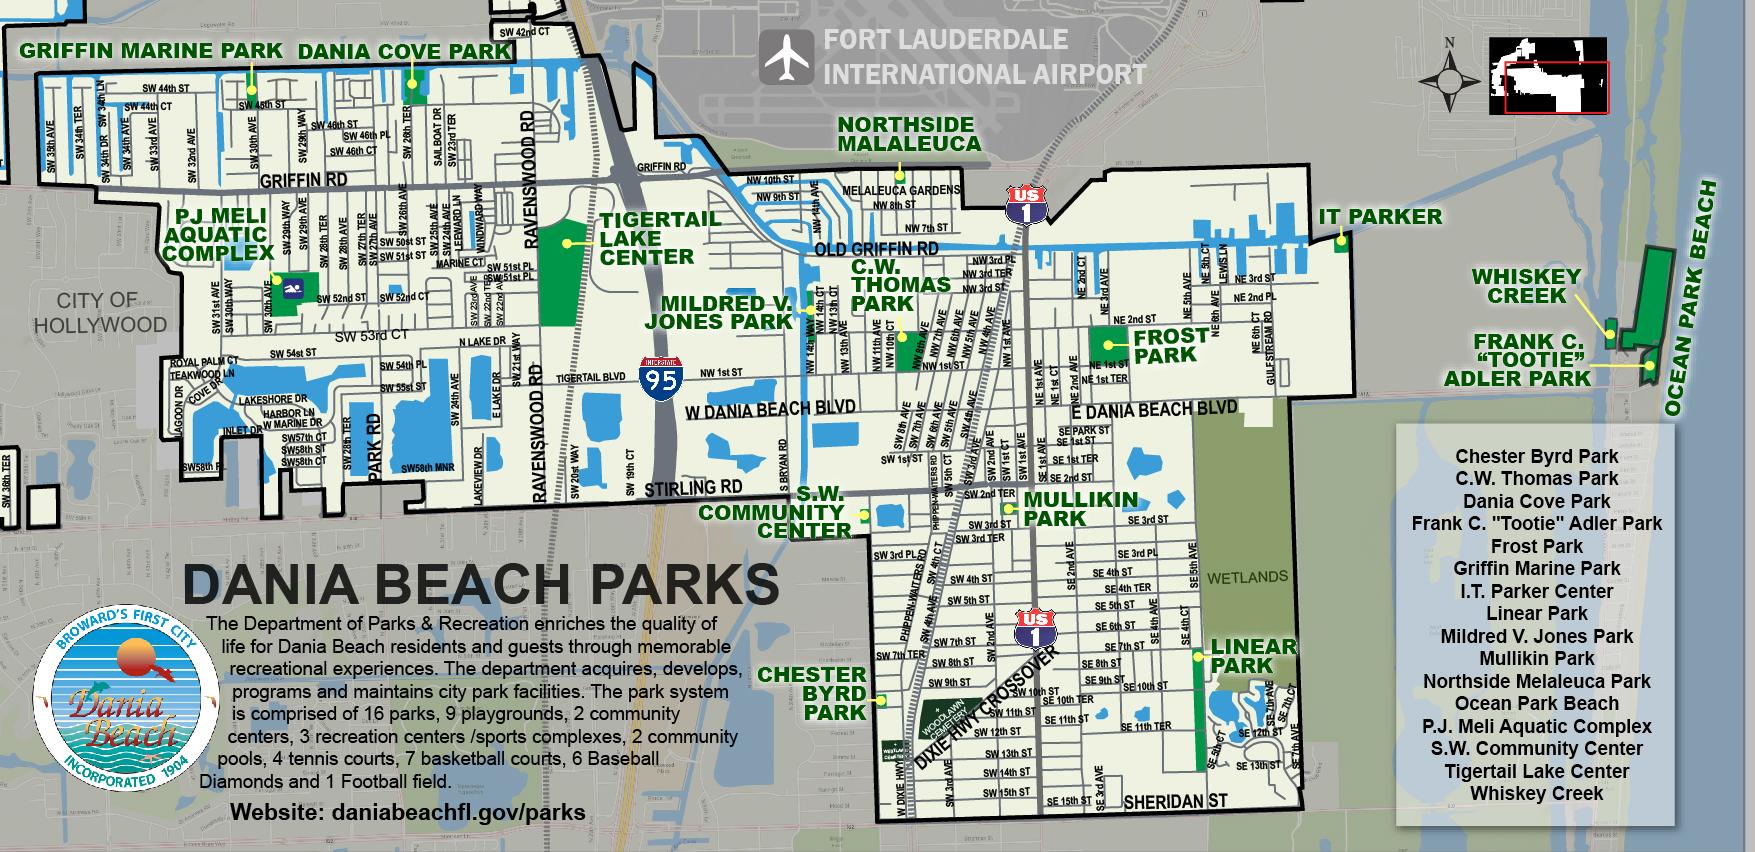 Dania Beach Parks Map